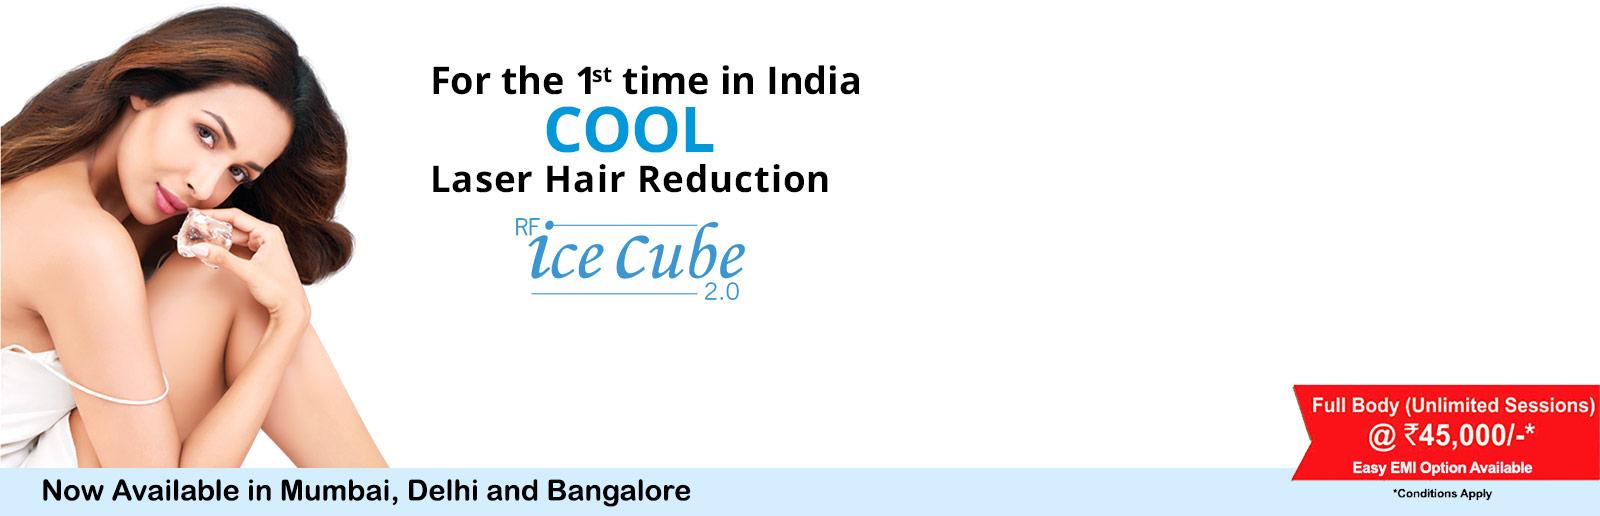 laser hair reduction